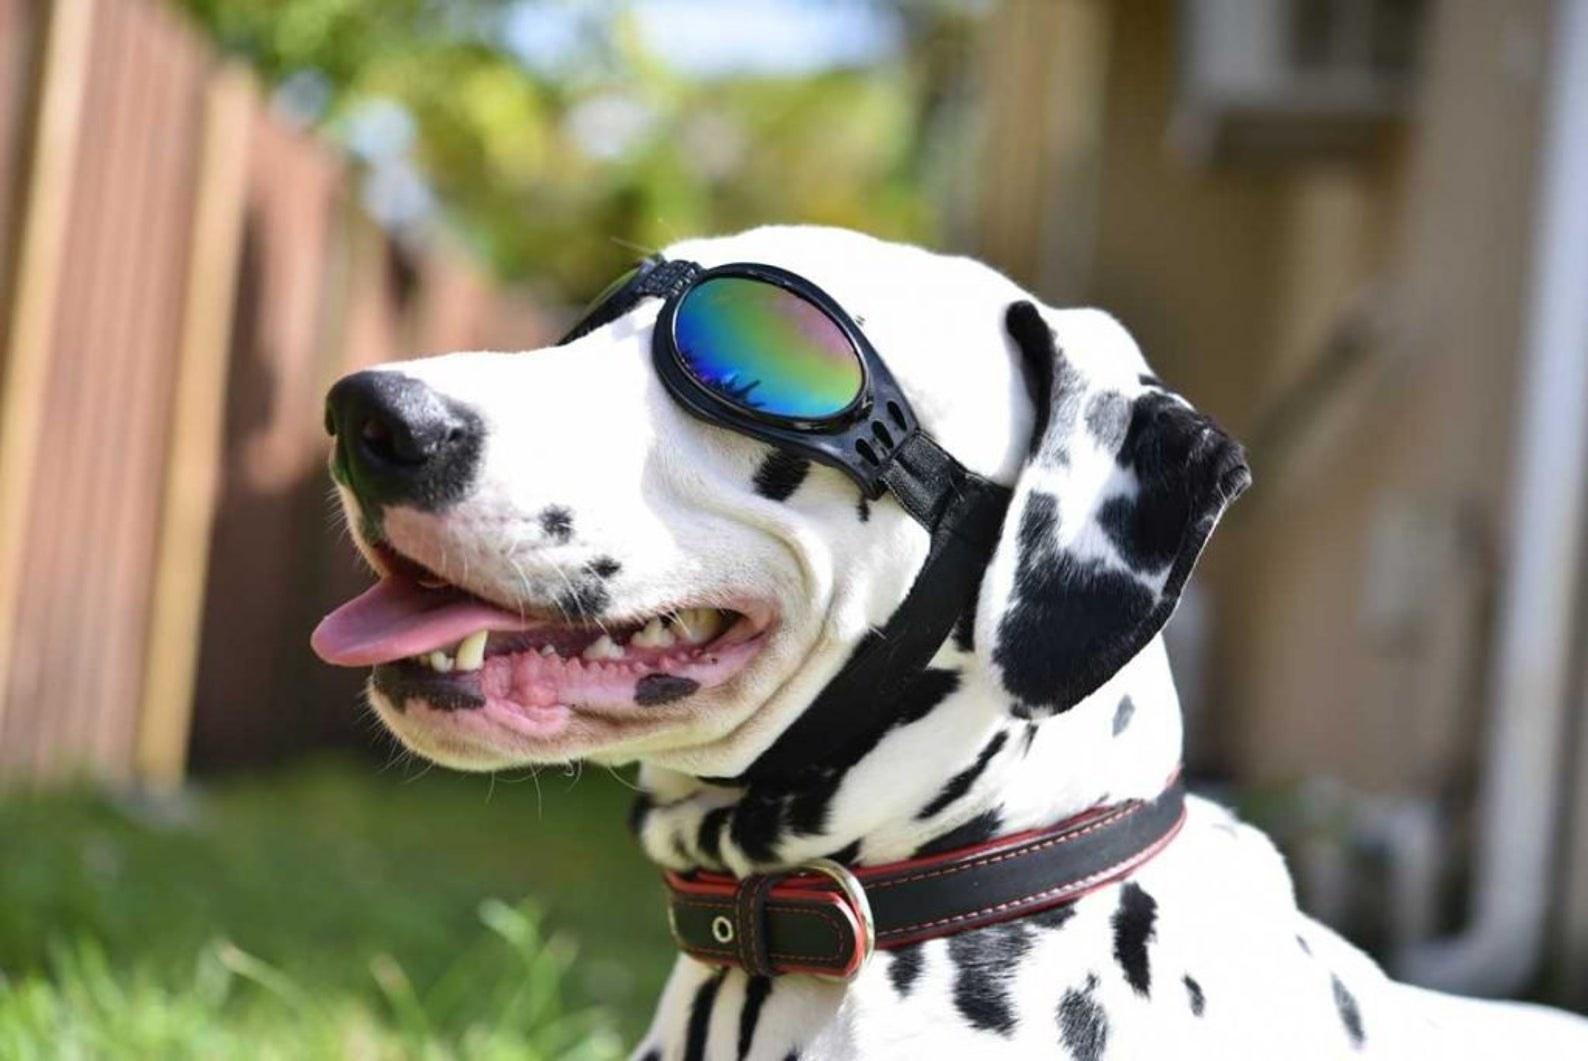 A Dalmatian wearing black dog goggles in a backyard